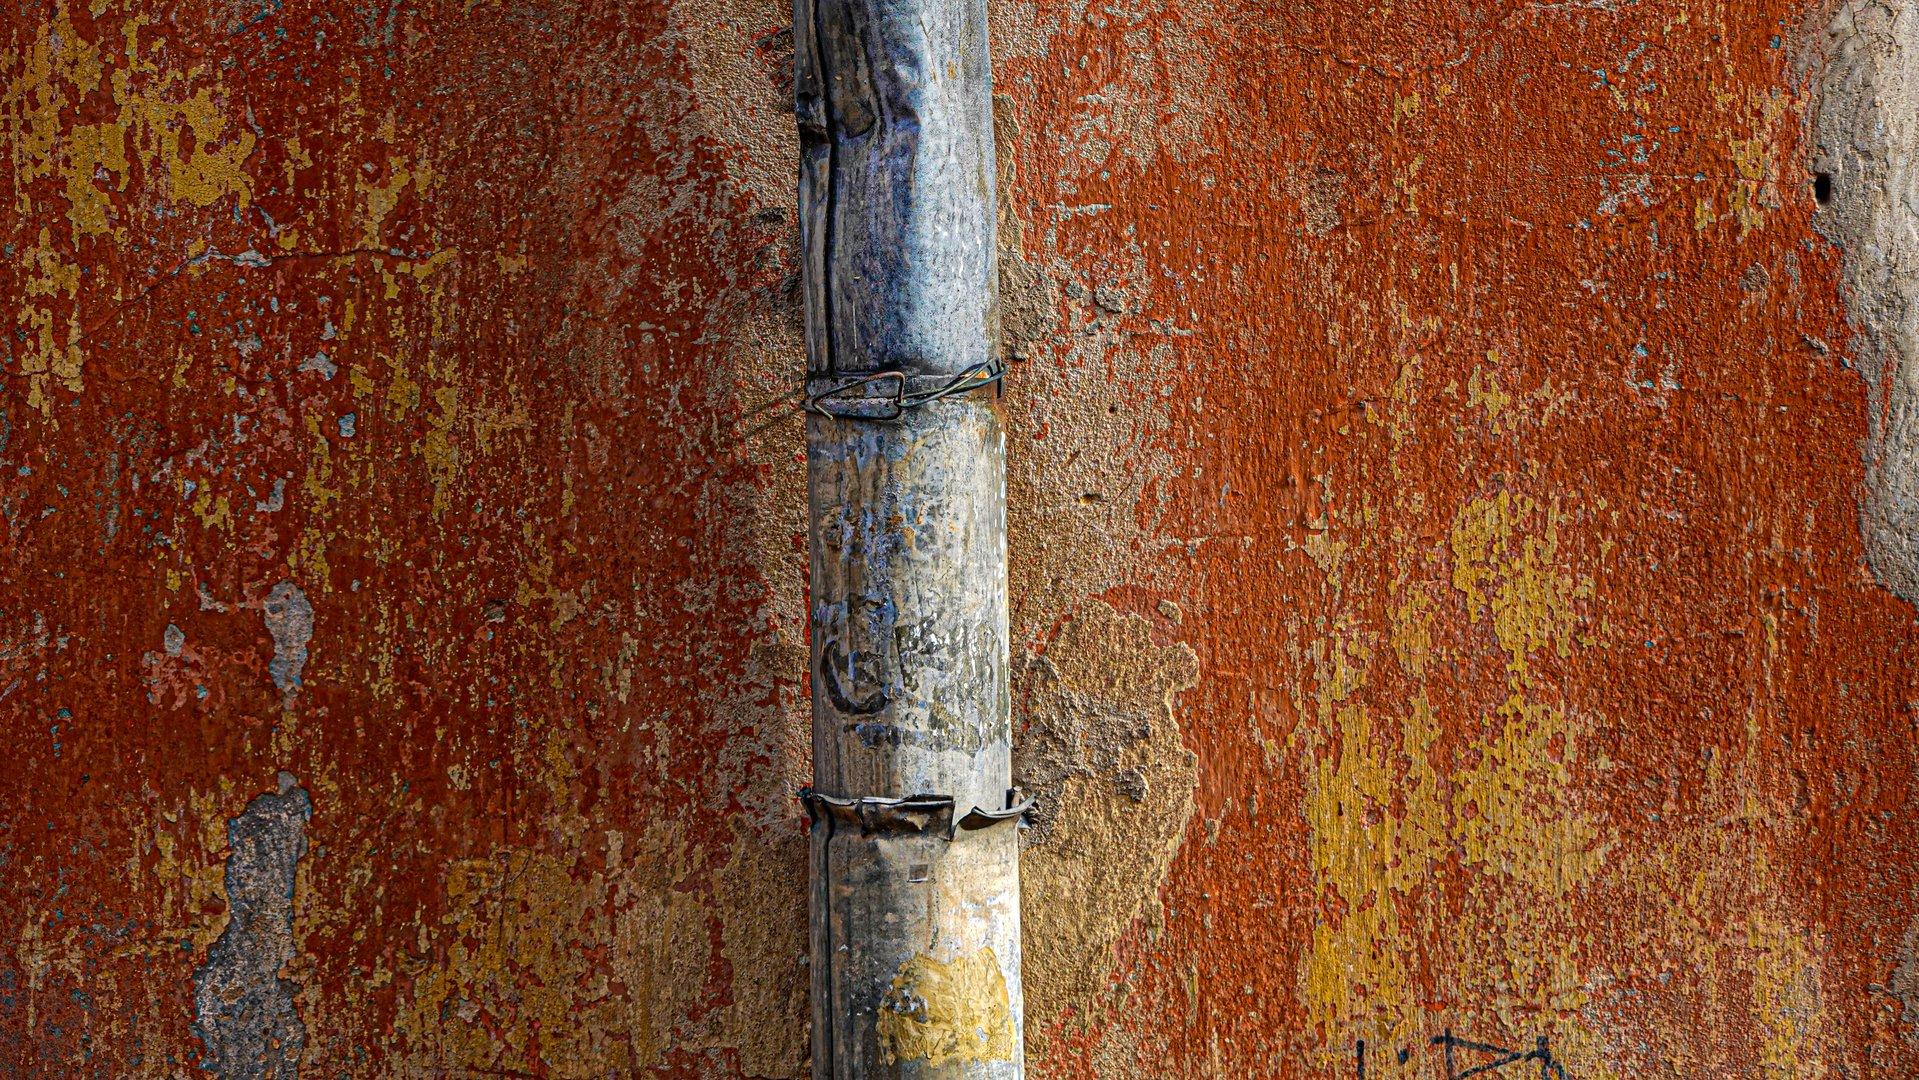 untitled, vlinius, lithuania